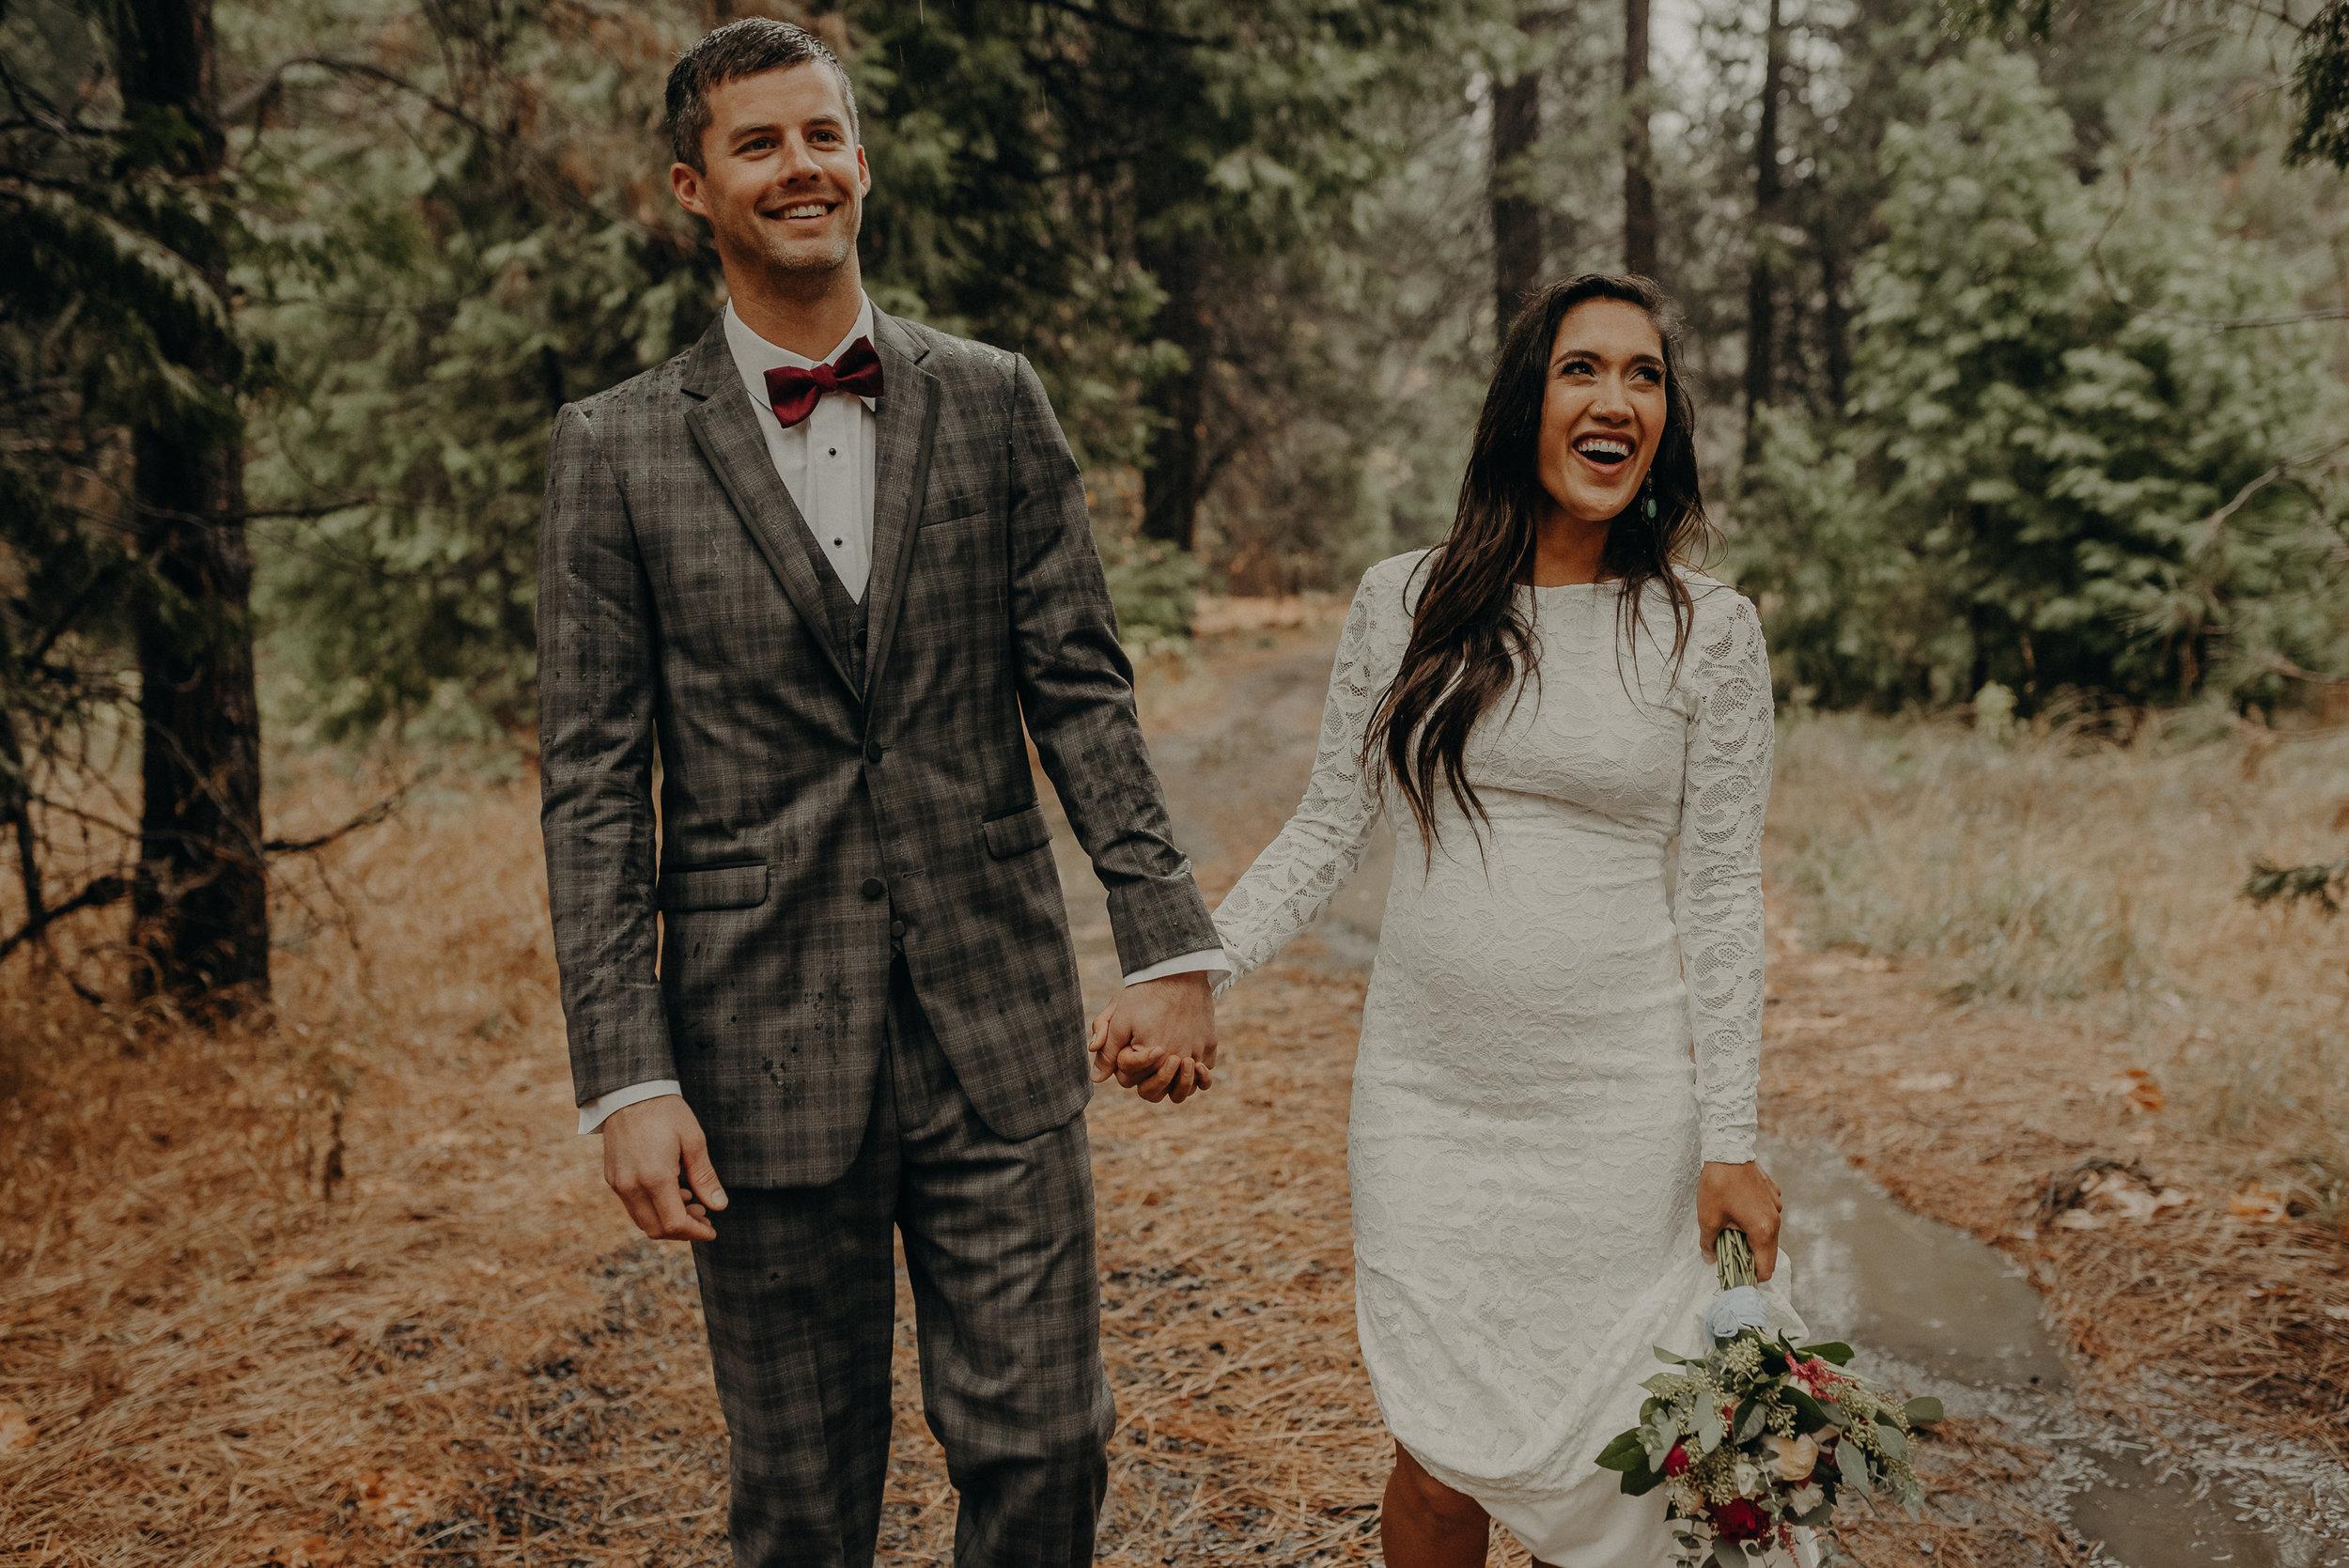 Isaiah + Taylor Photography - Yosemite Elopement - Los Angeles Wedding Photographer-18.jpg